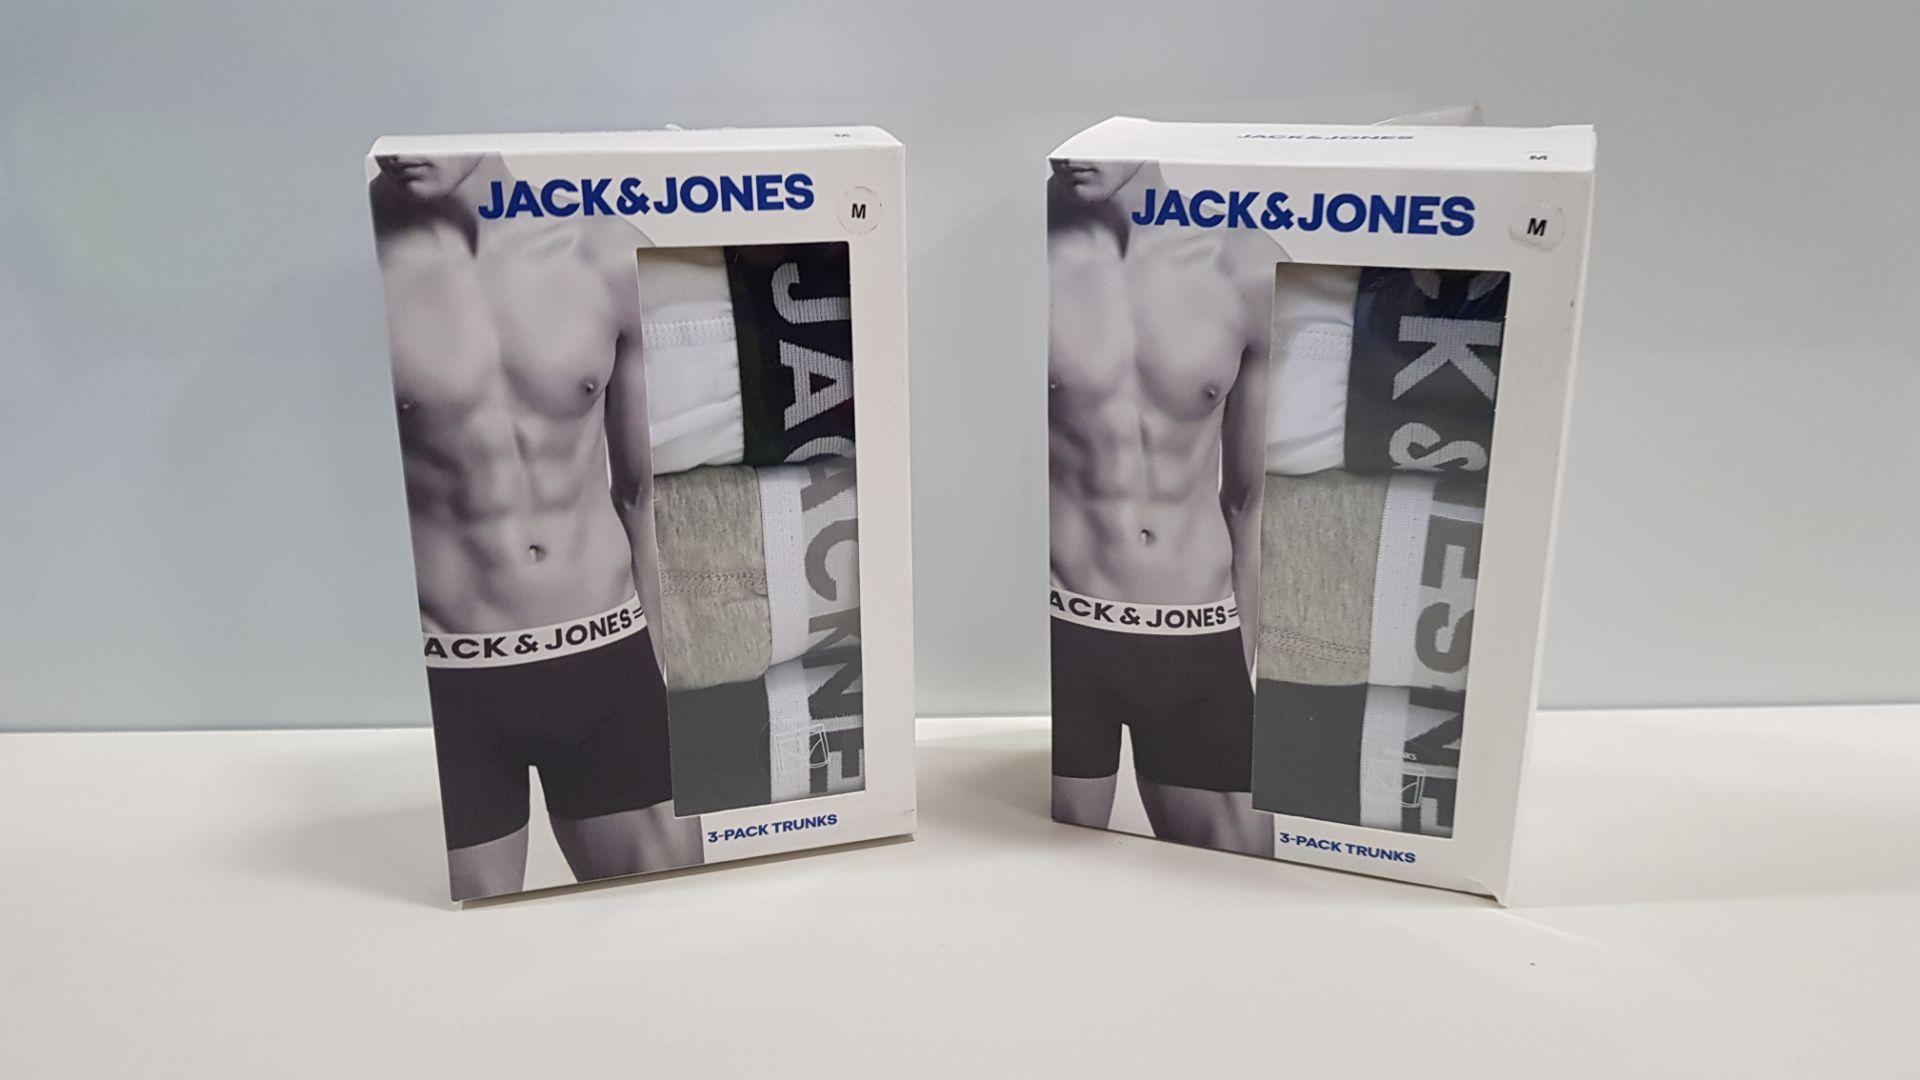 18 X BRAND NEW JACK & JONES 3 - PACK TRUNKS - 11 X SIZE MEDIUM, 2 X SIZE LARGE AND 5 X SIZE EXTRA